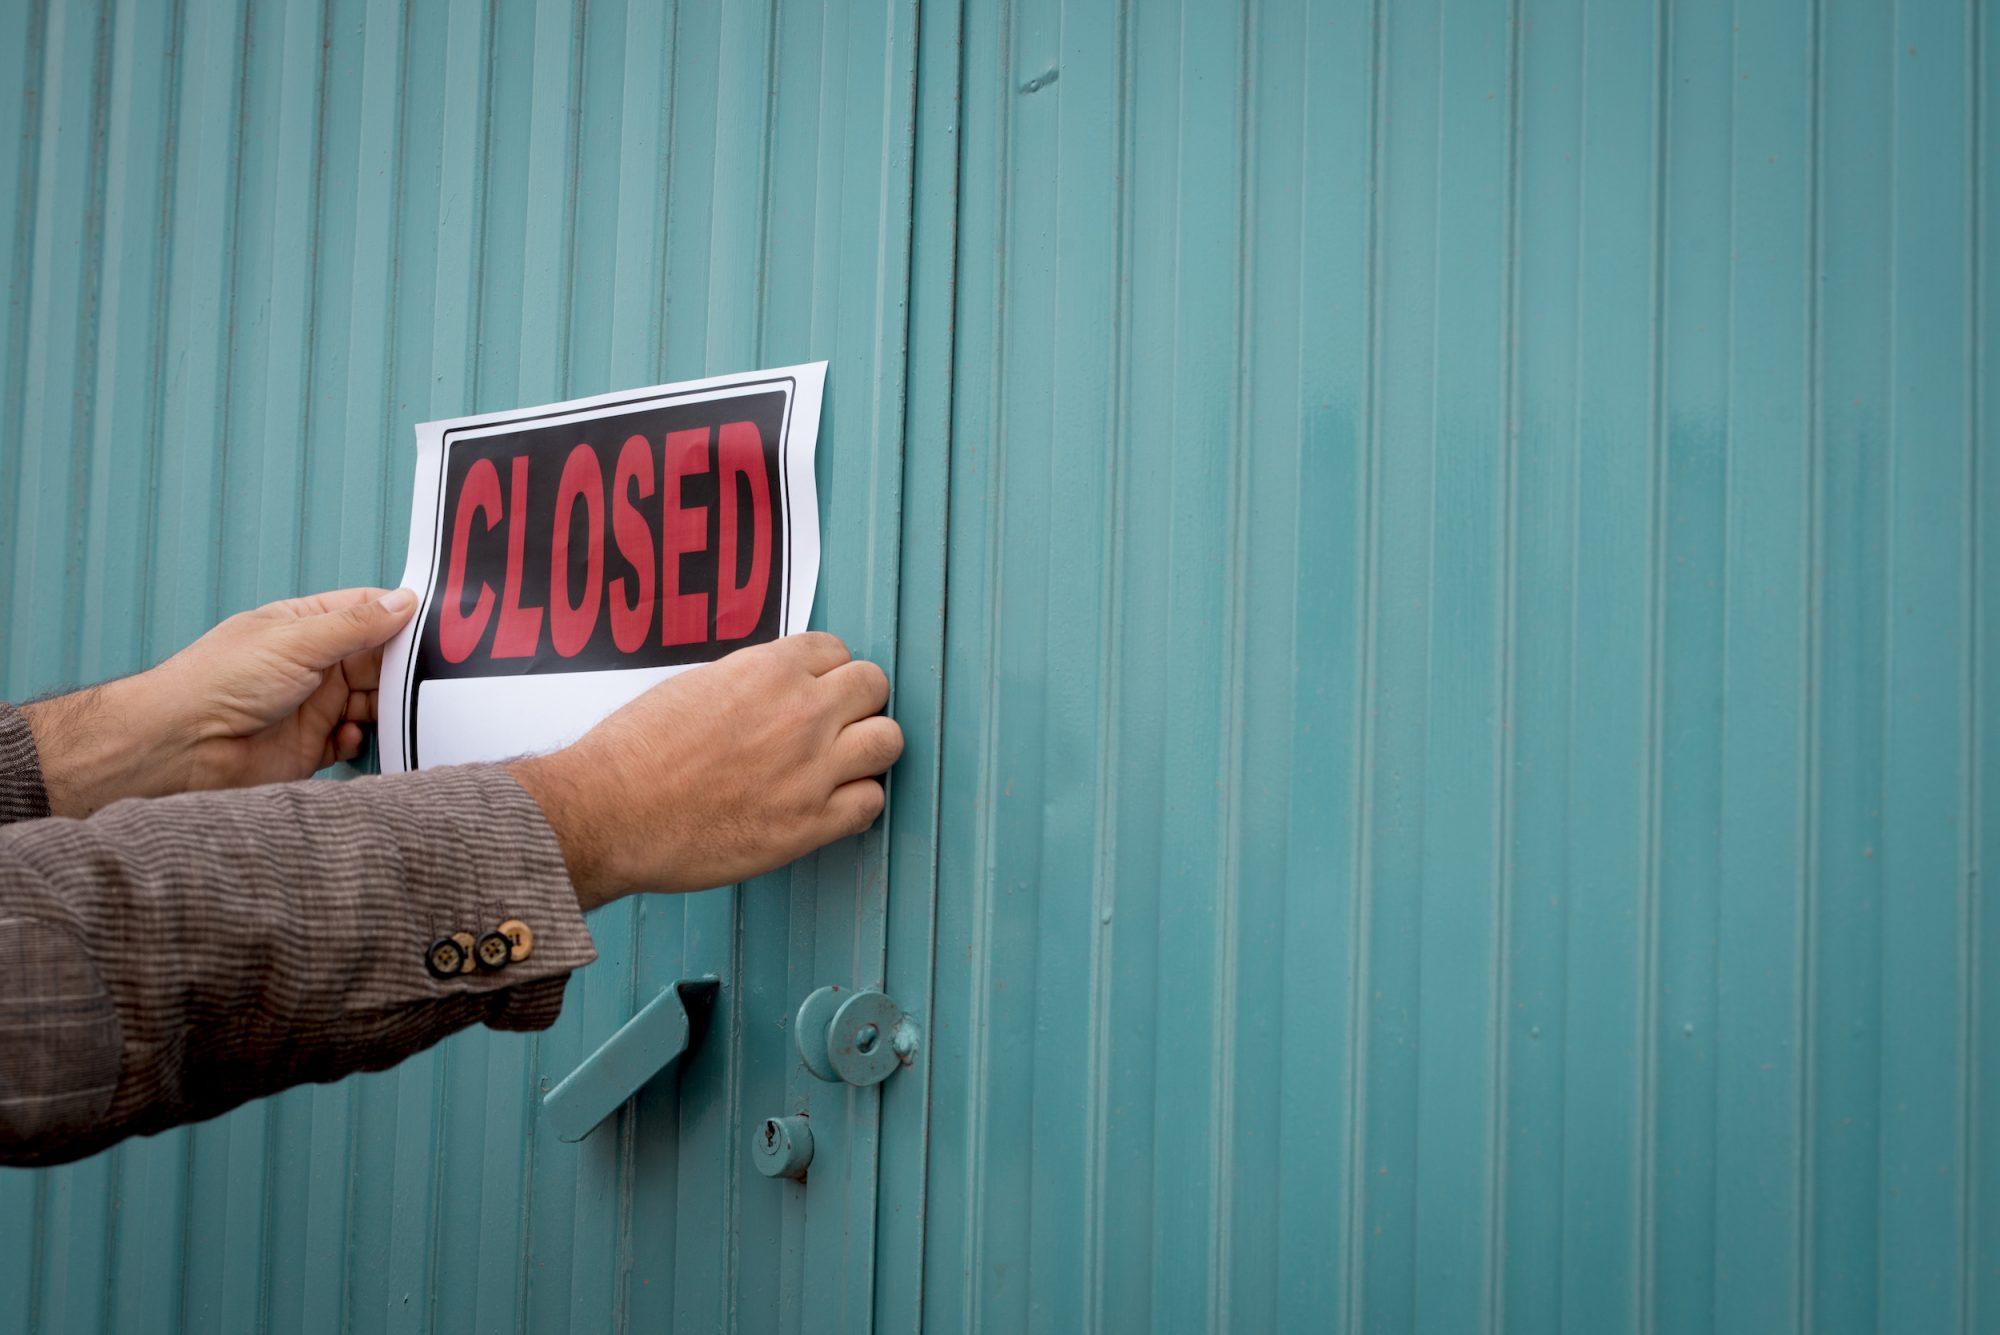 Germany Extends Partial Lockdown until Jan. 10